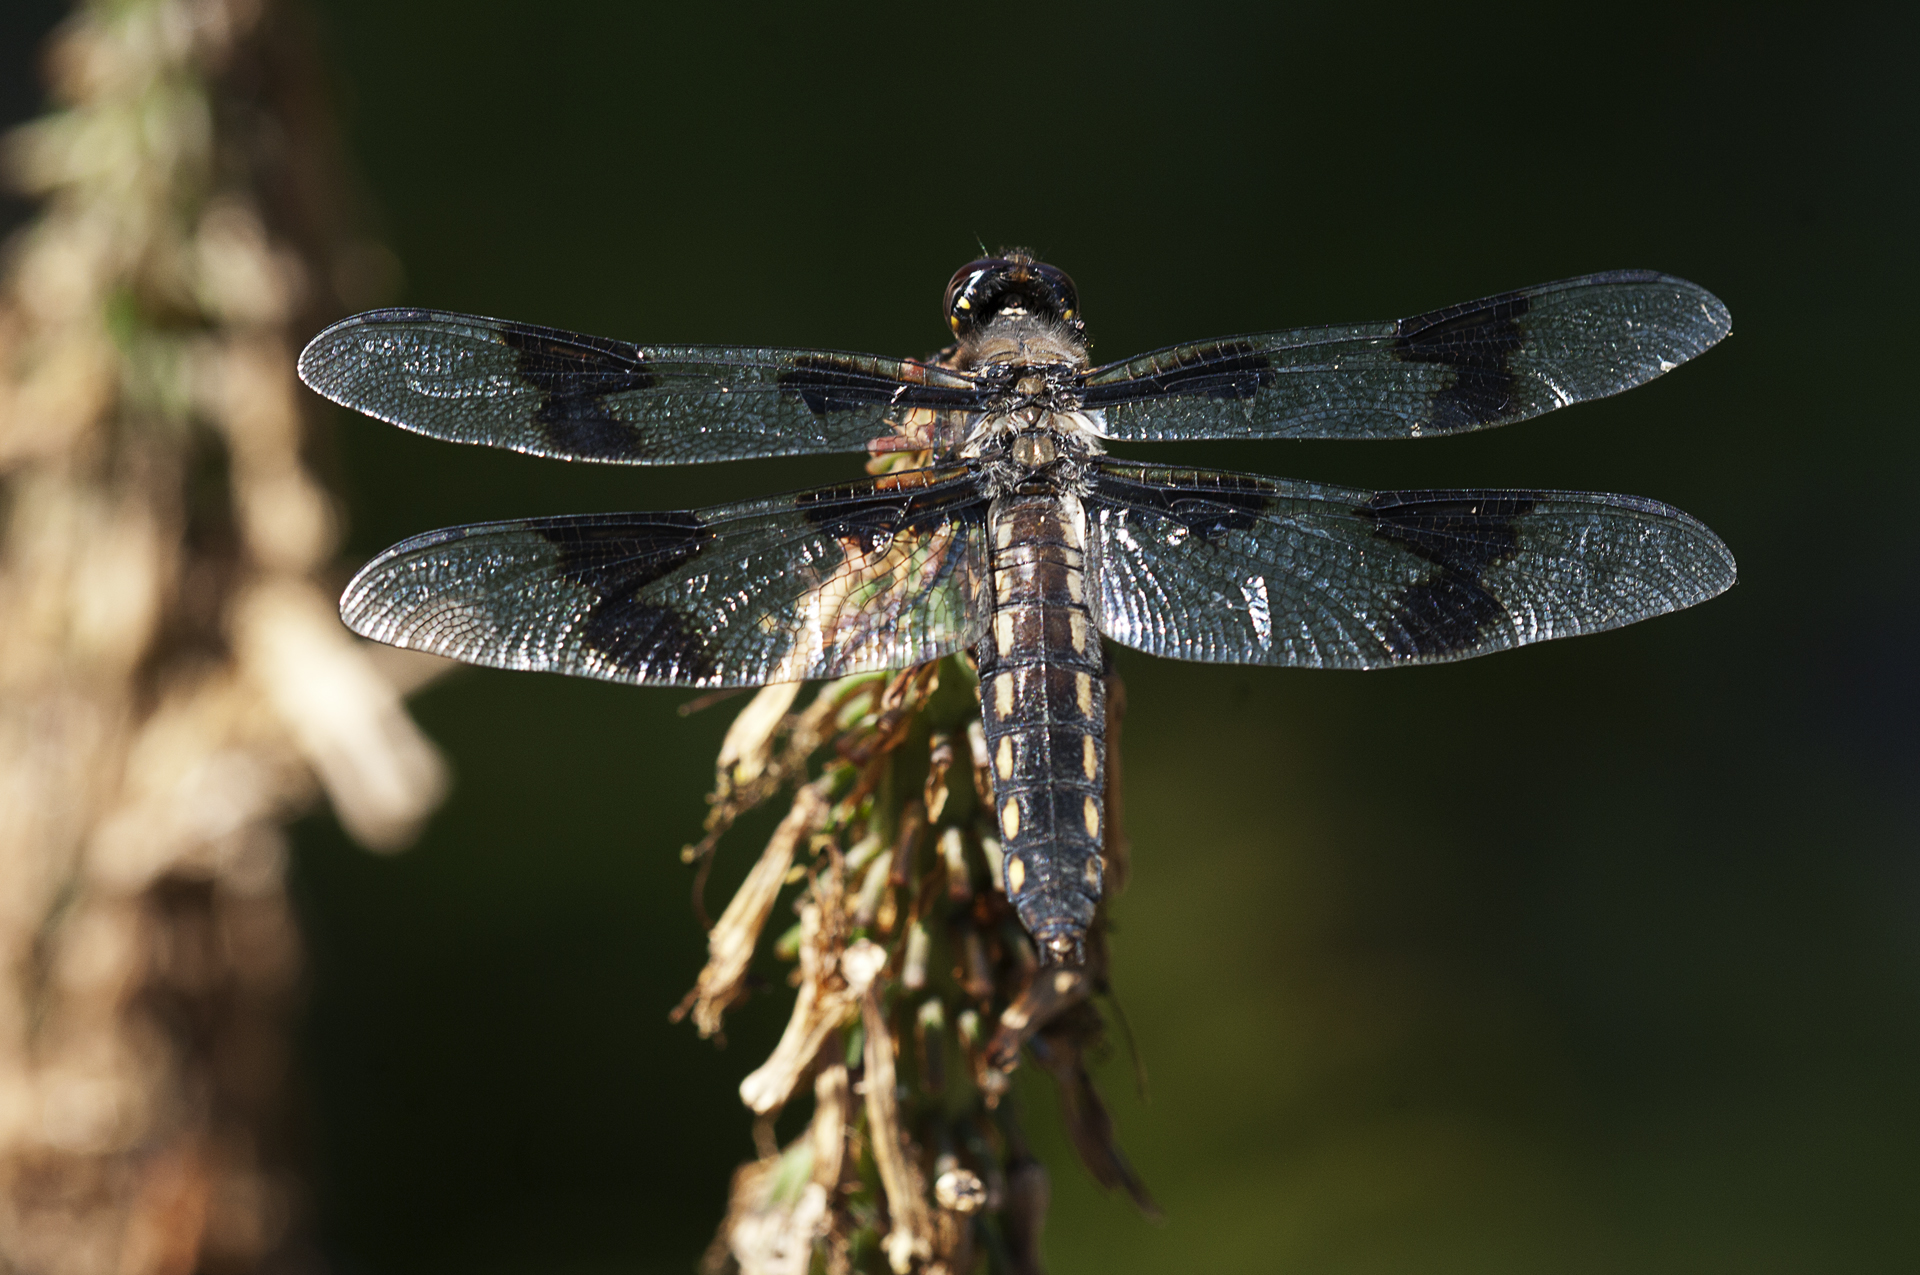 8 spotted skimmer